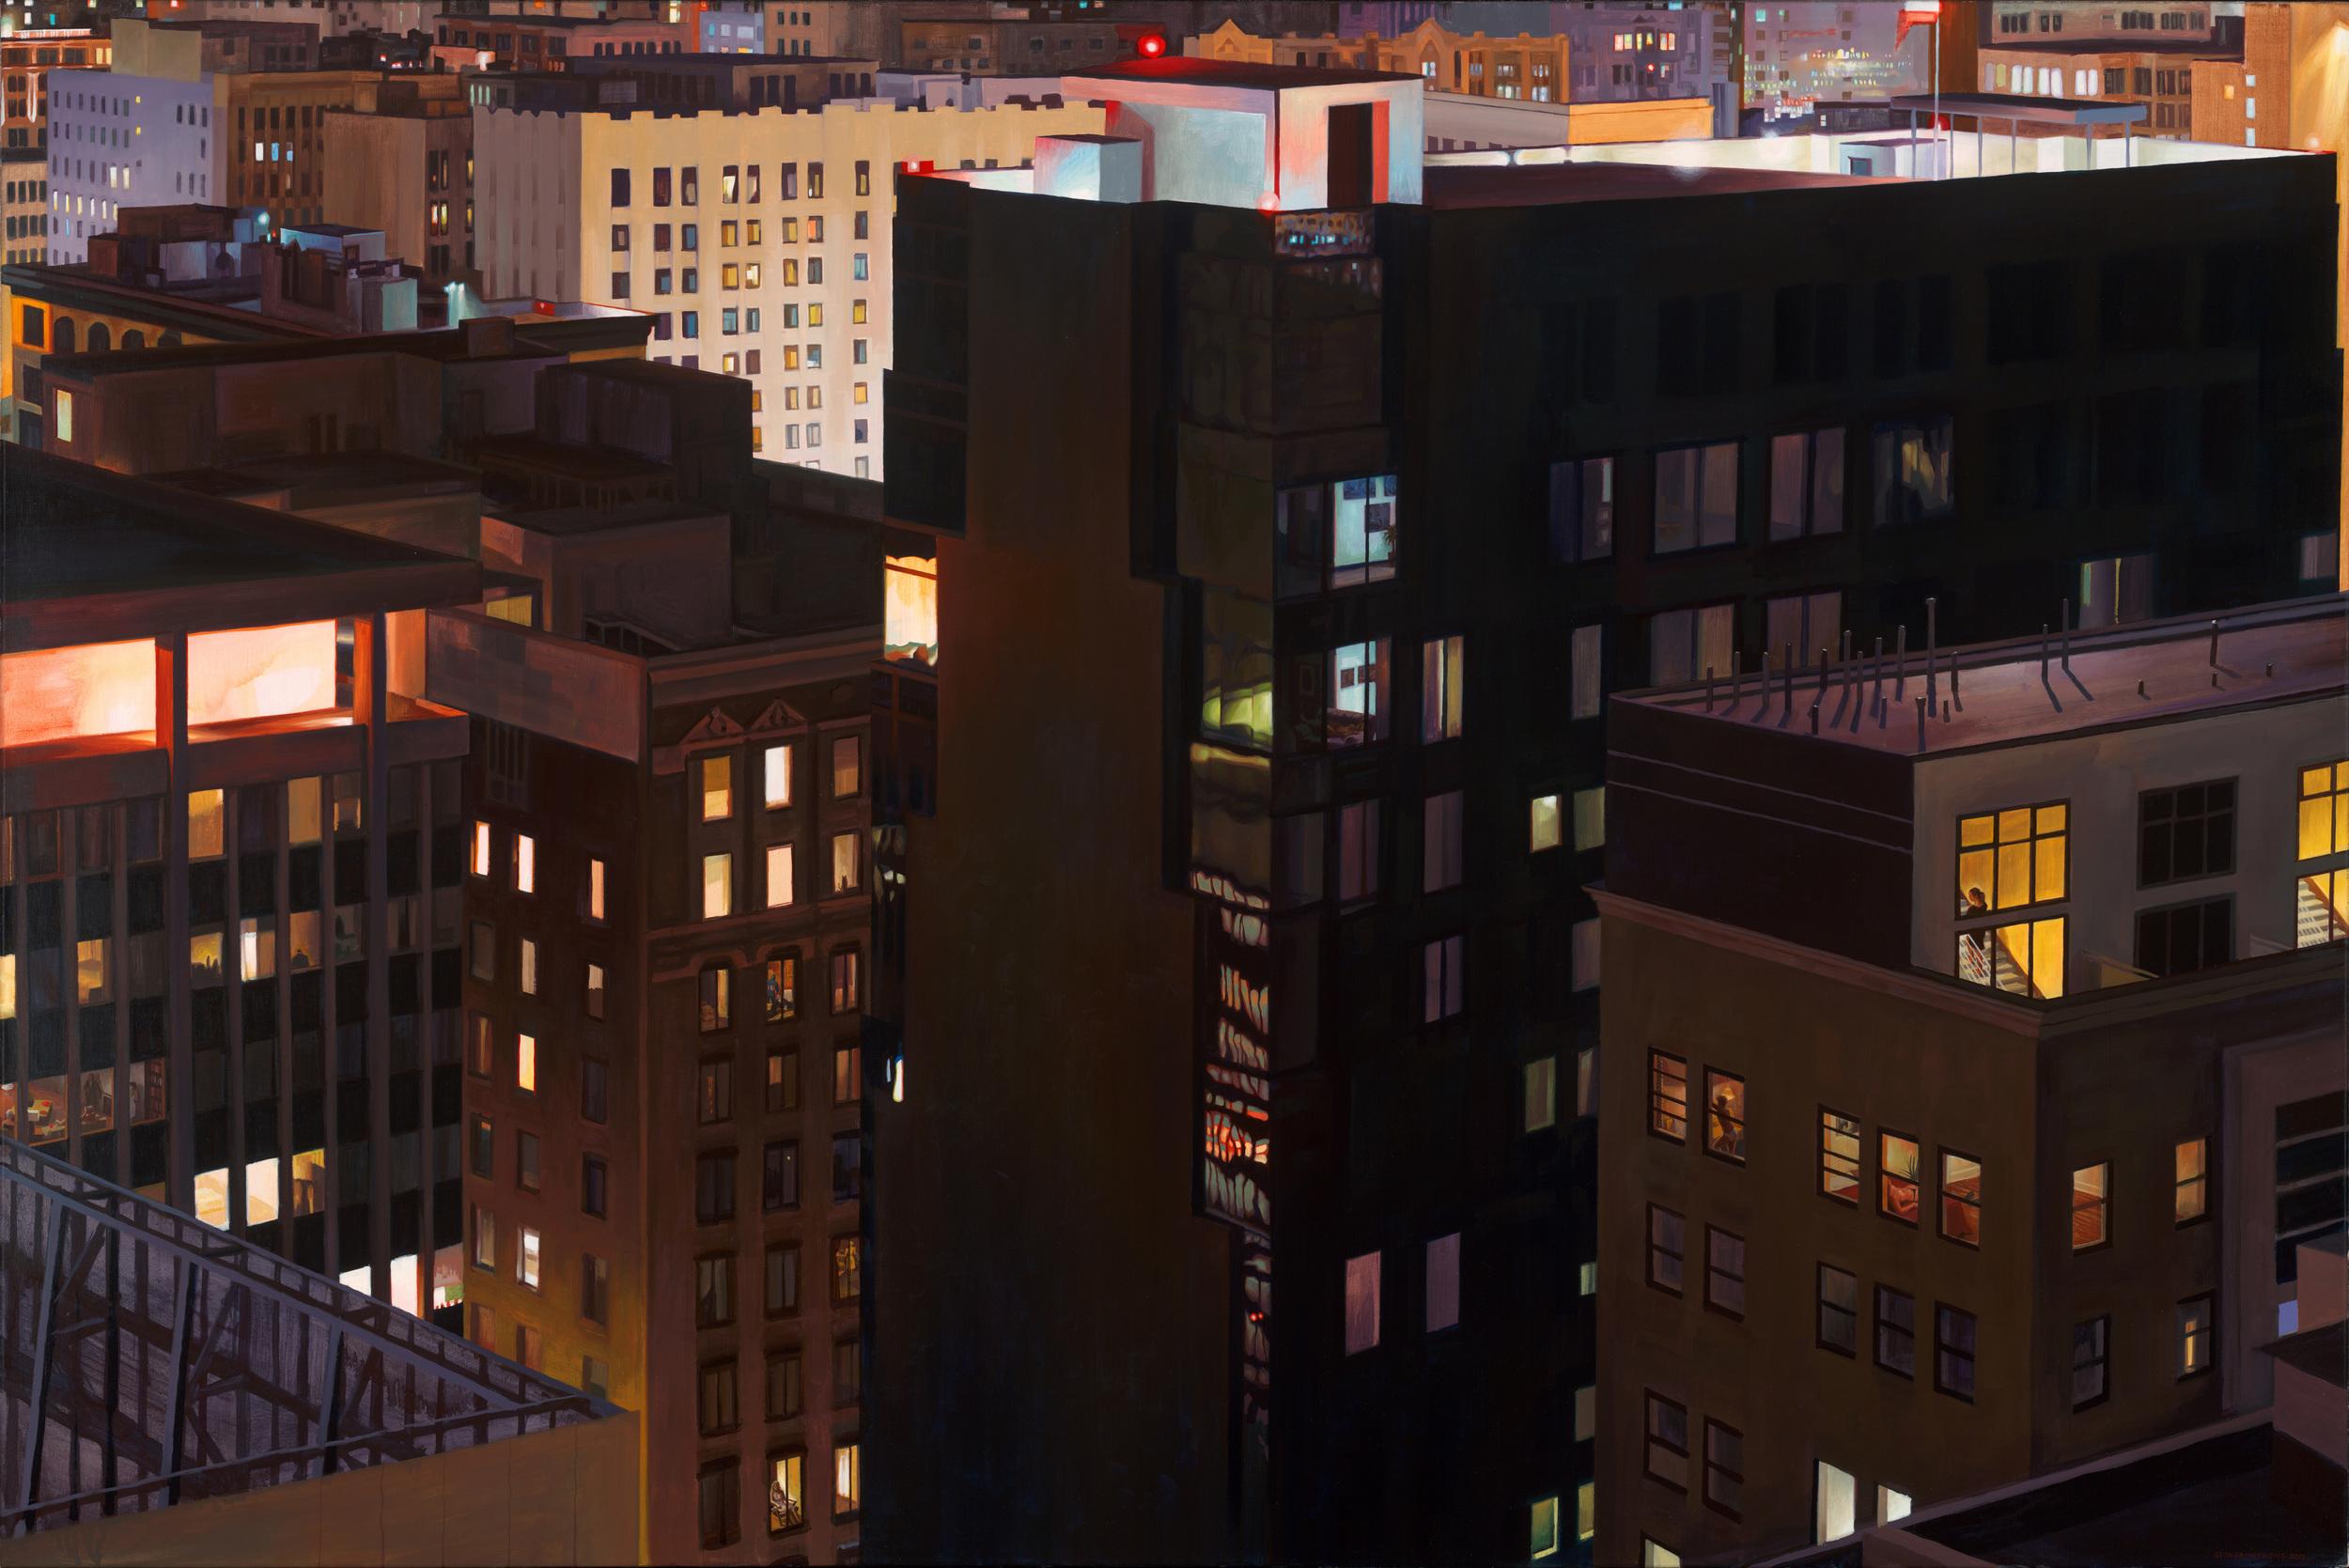 """Lovin' Thy Neighbor"", Oil on canvas, 40 x 60 in."